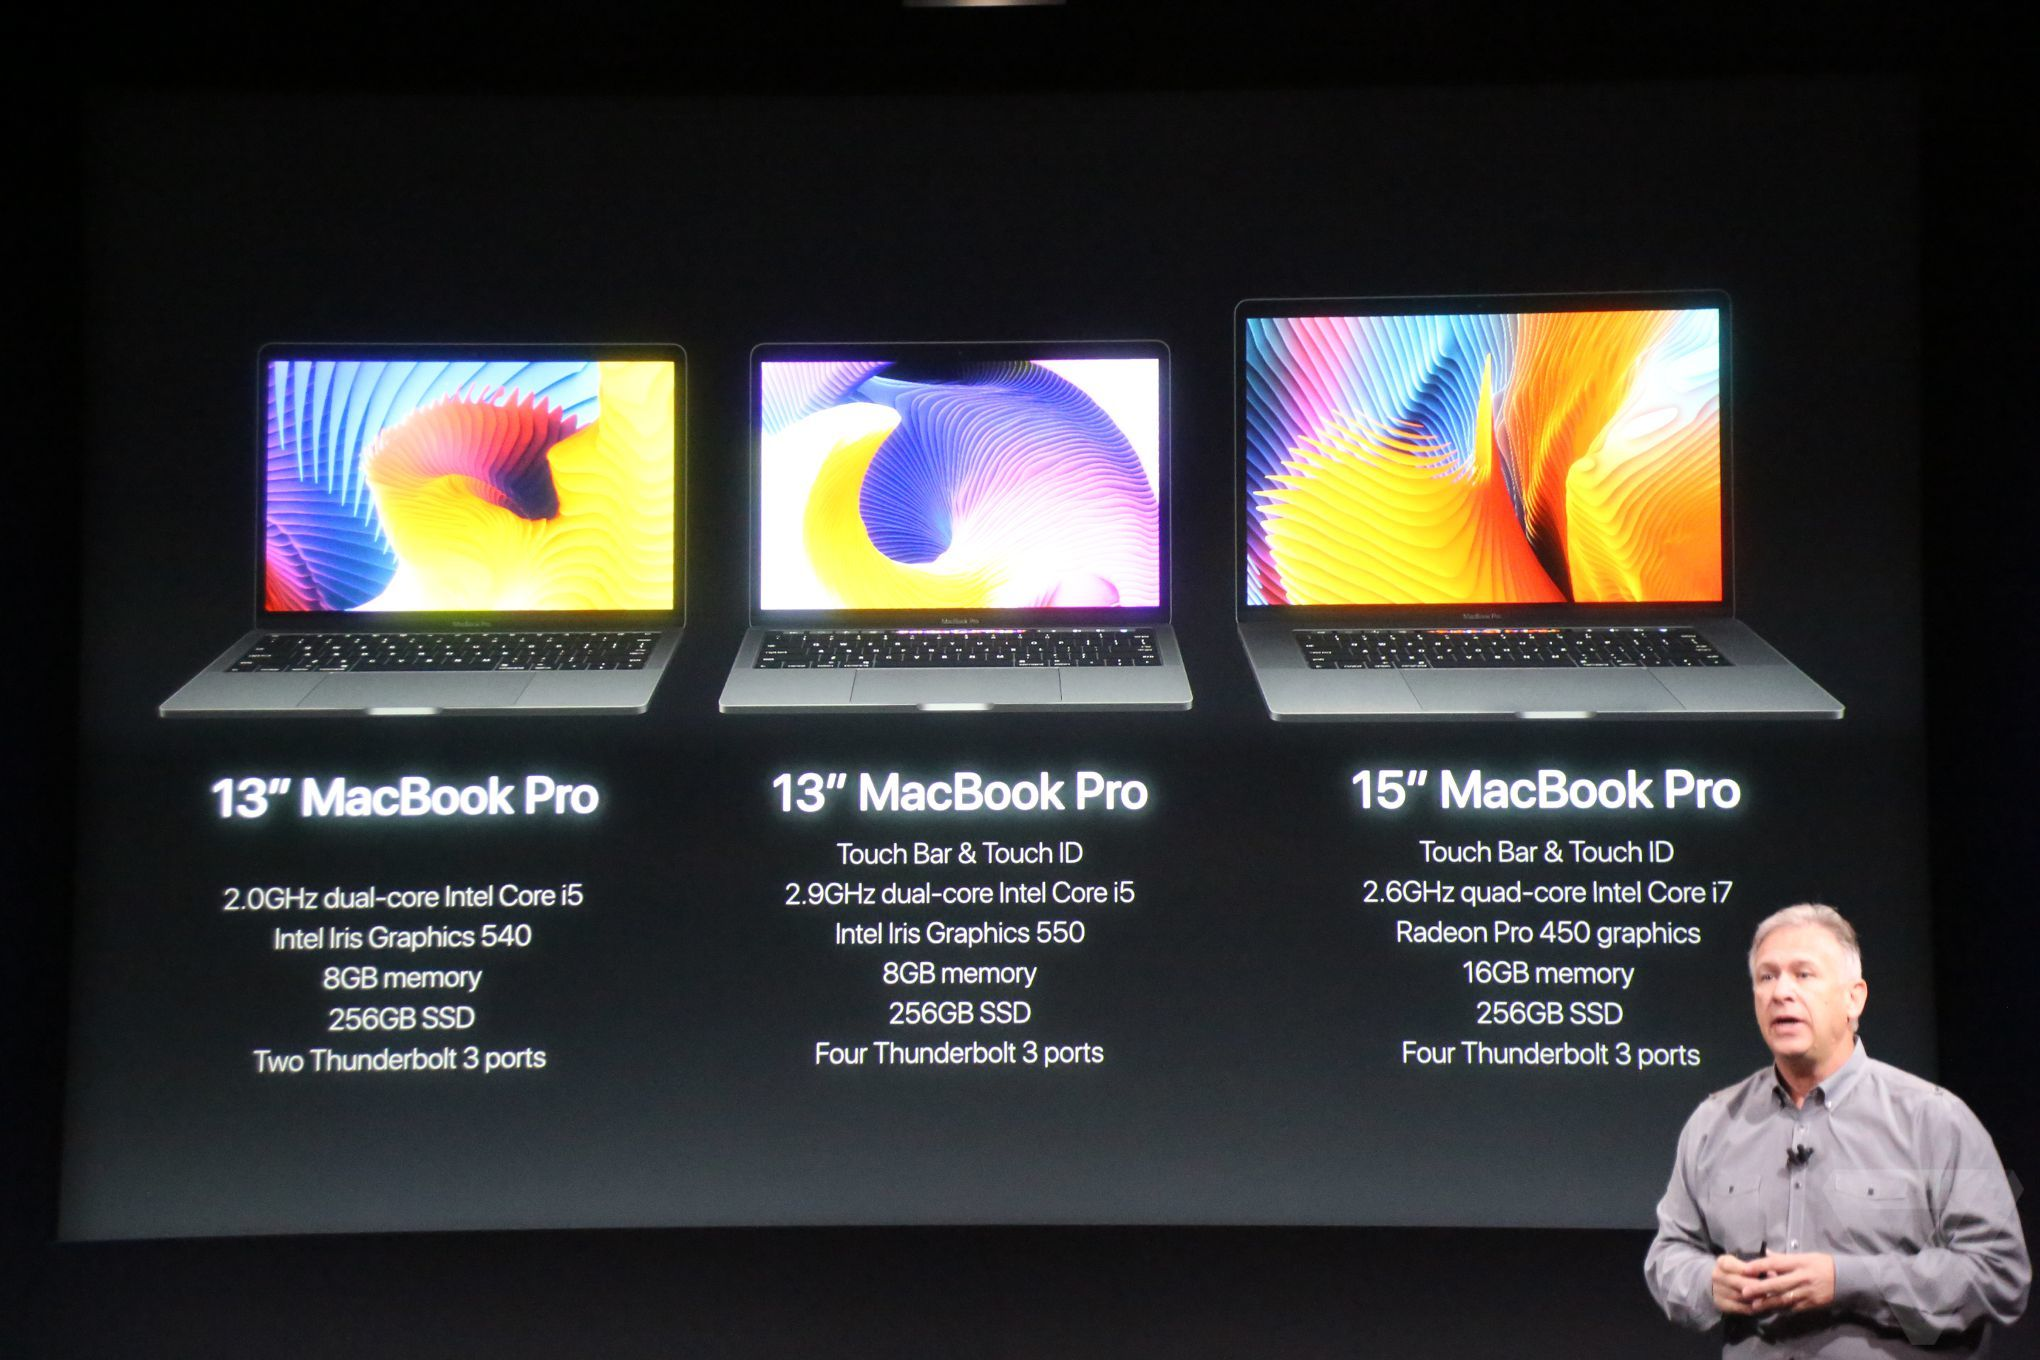 New Macbook Pros using Radeon Pro graphics (Polaris Architecture) : Amd